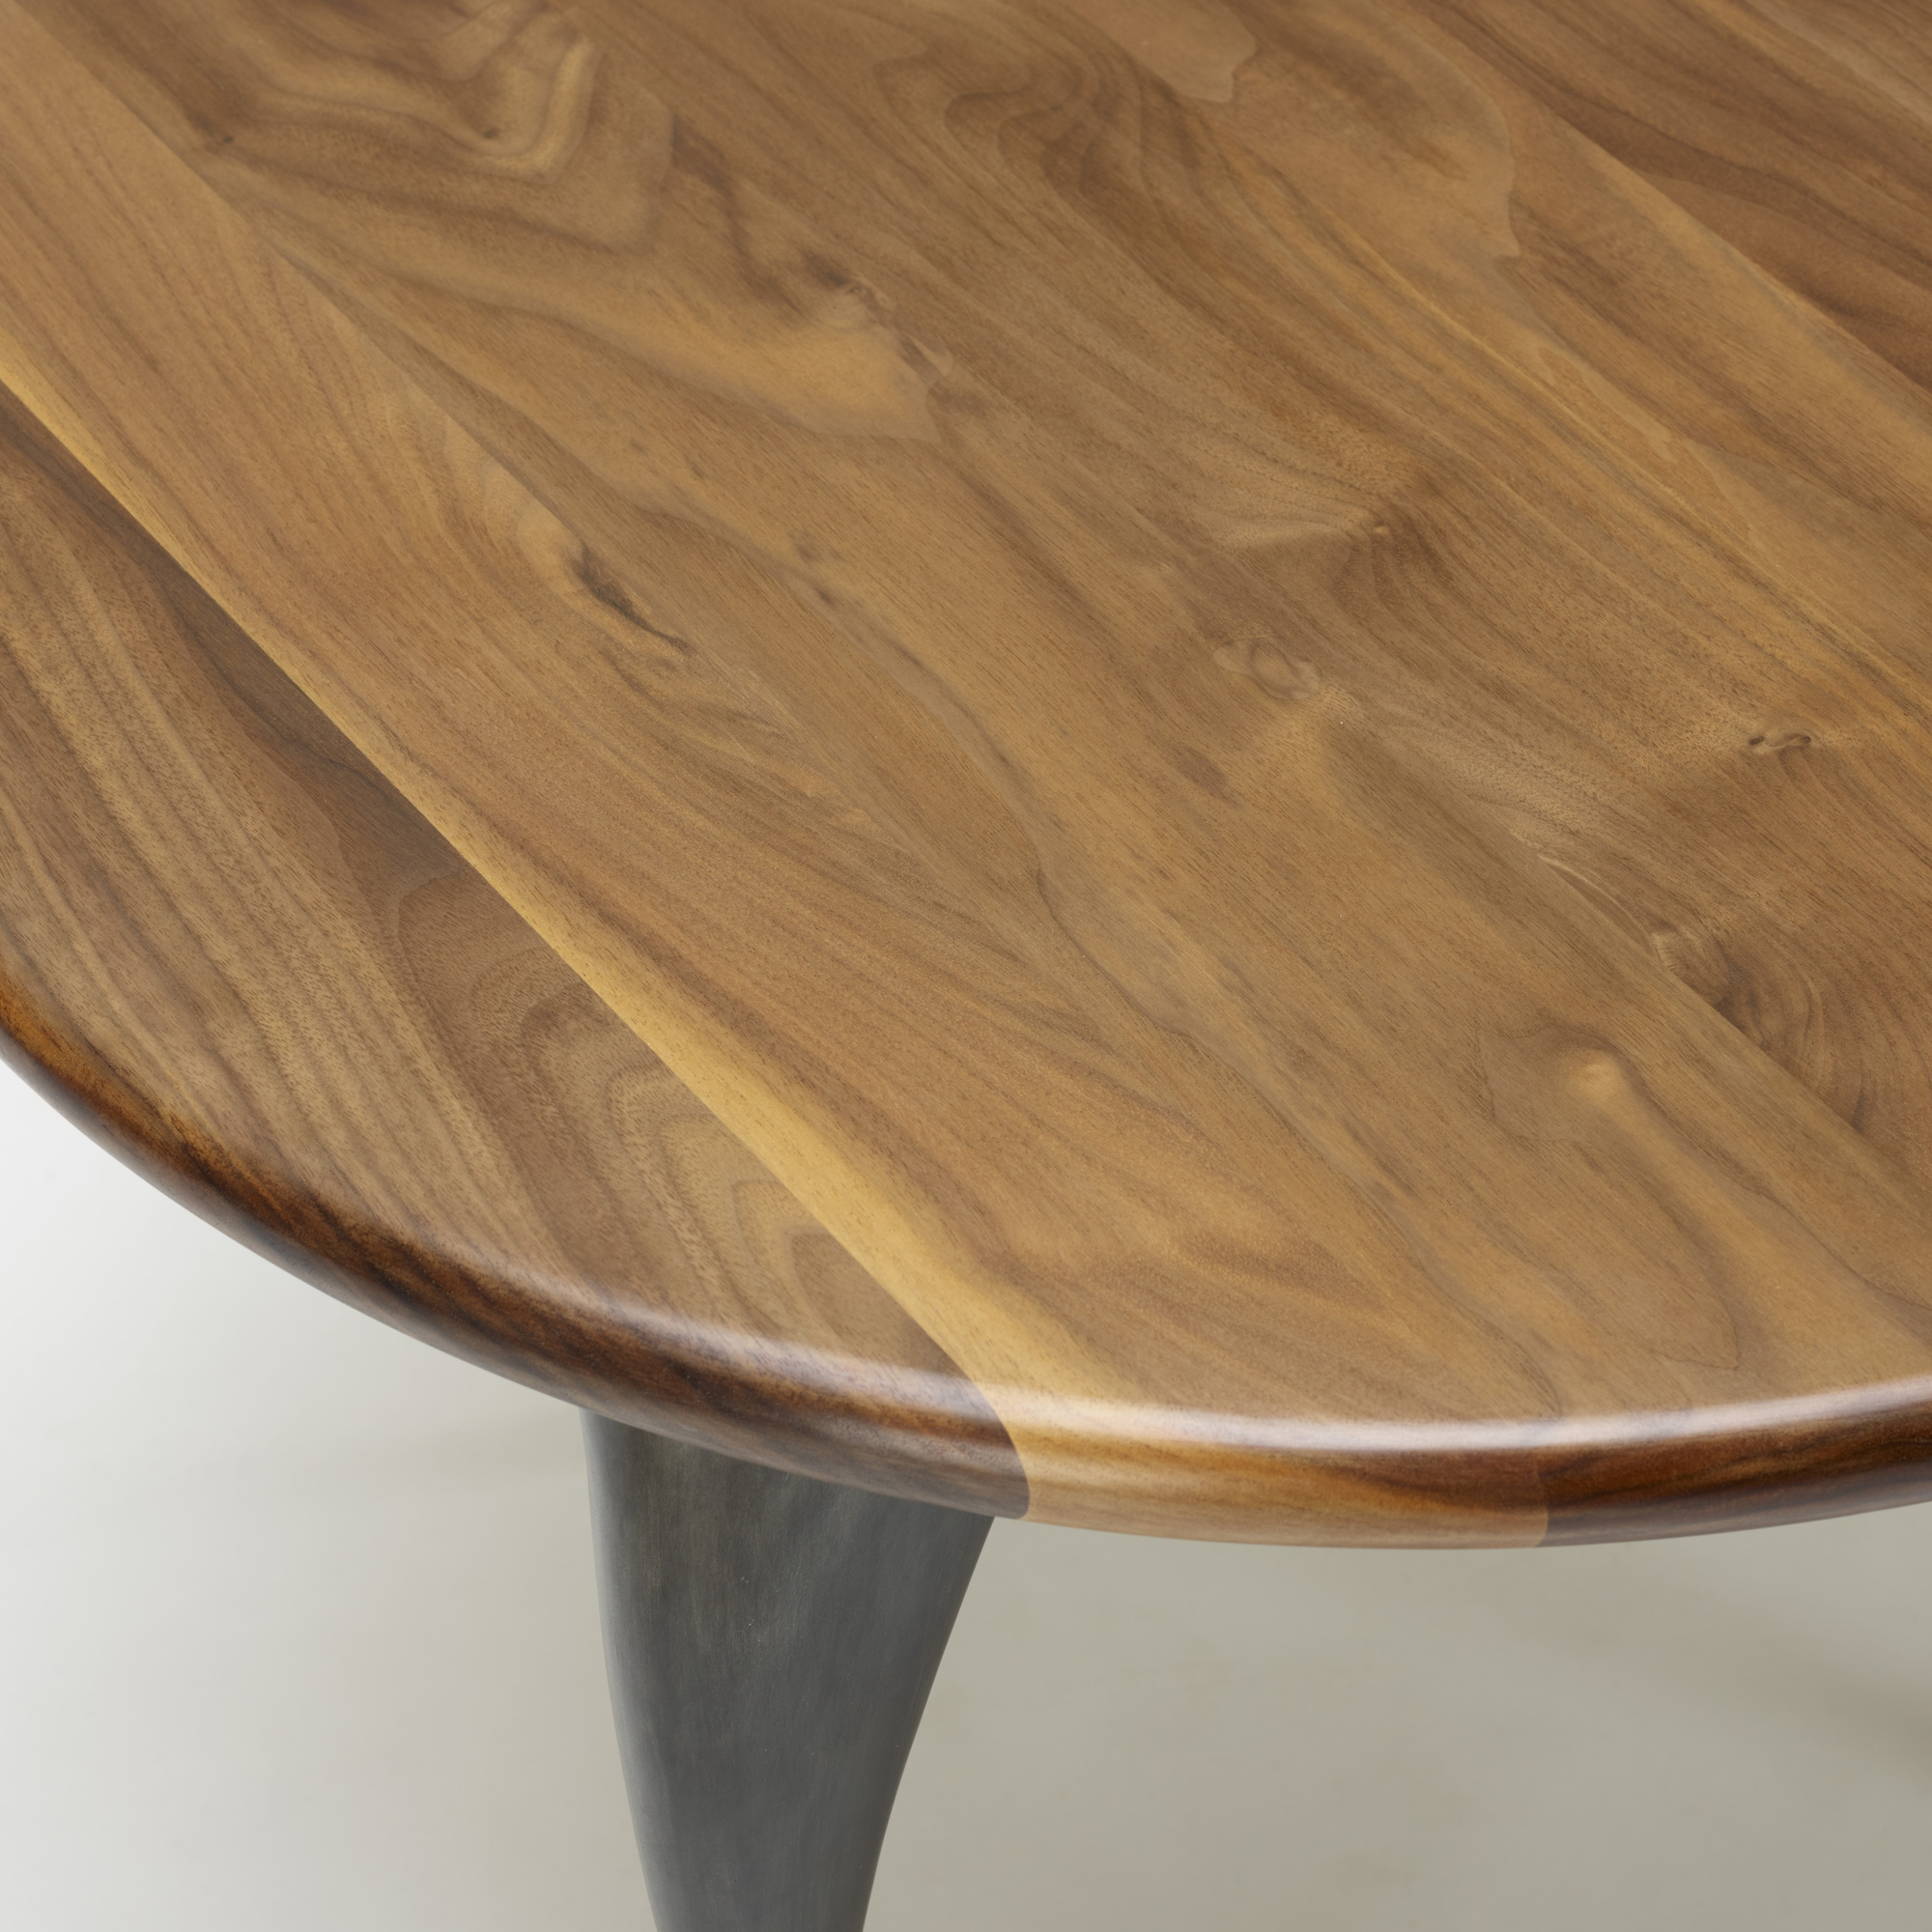 201: Jordan Mozer / Danieli coffee table (2 of 2)